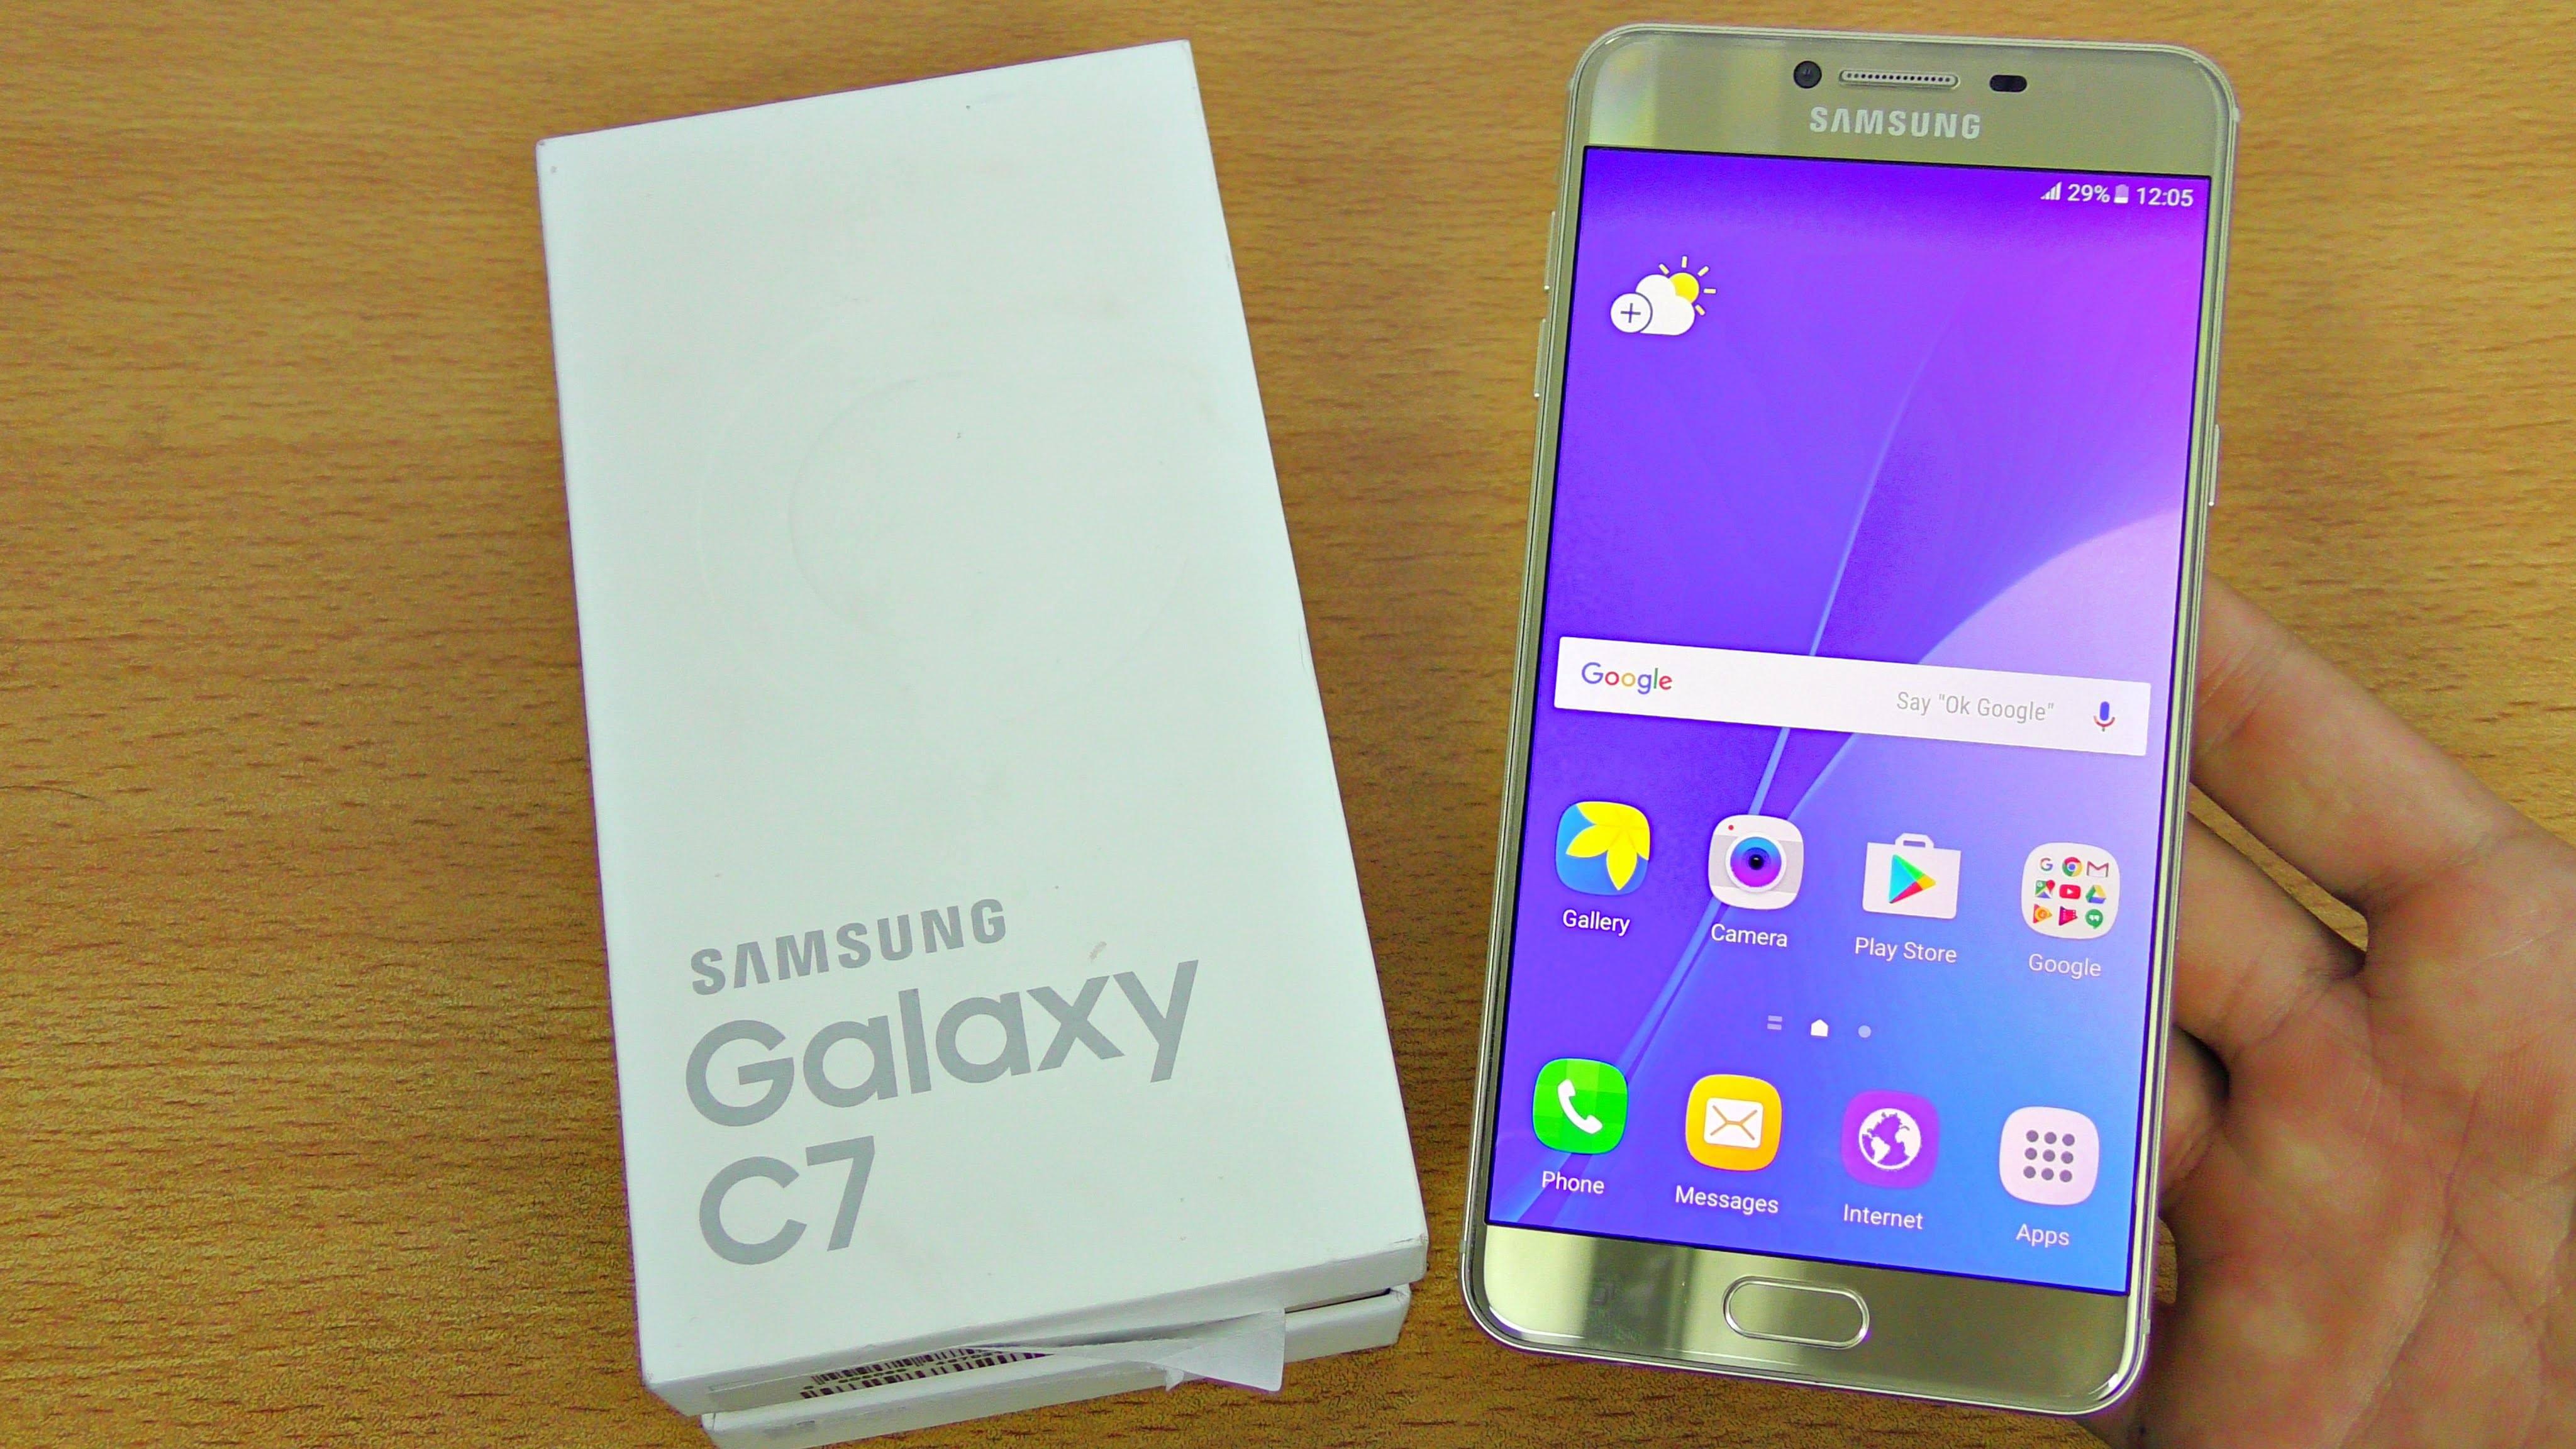 Samsung Galaxy C7 Price